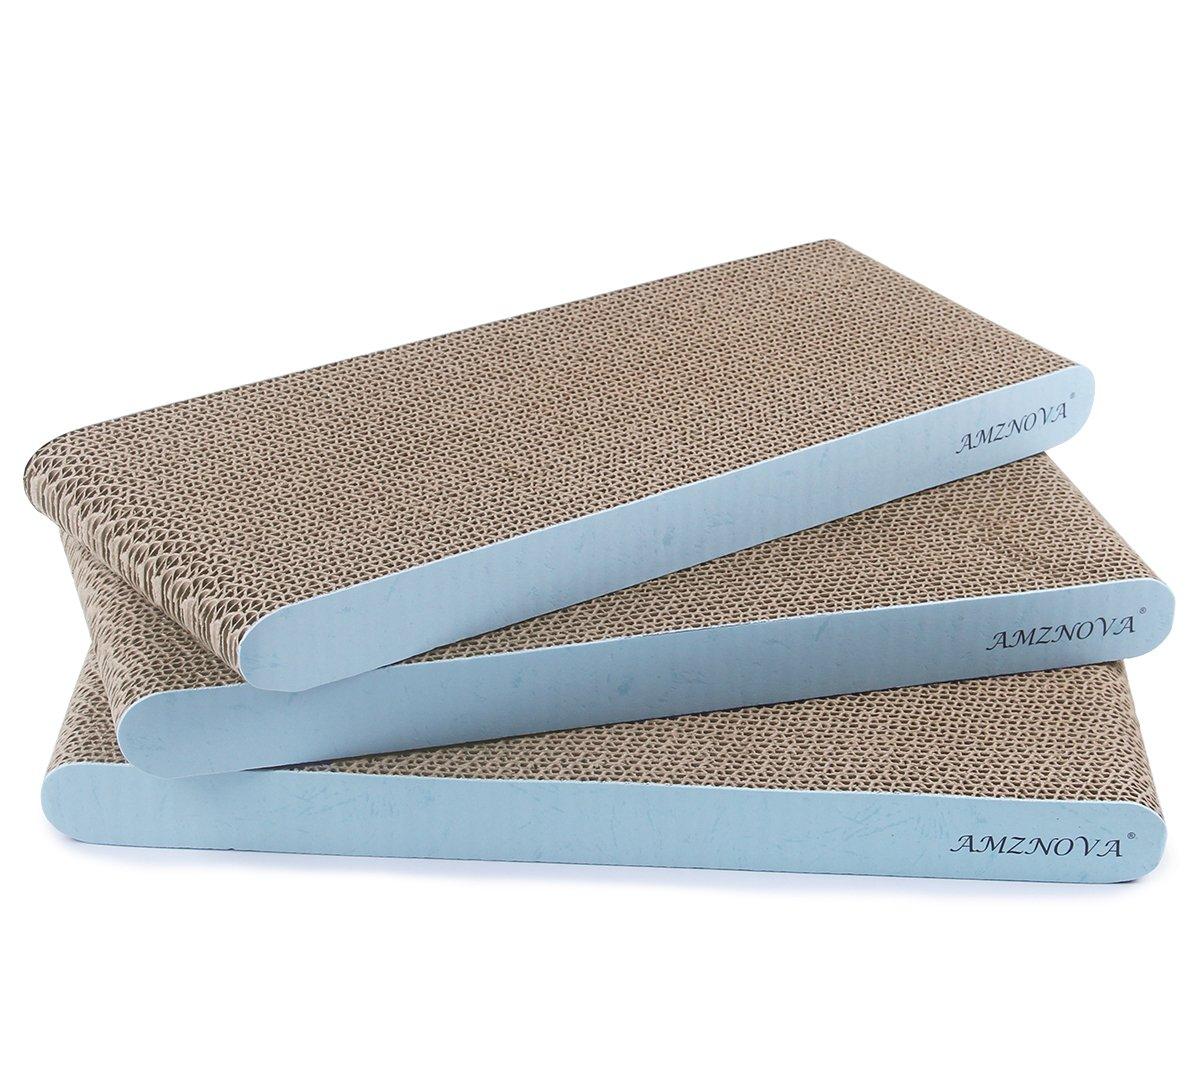 AMZNOVA Cat Scratcher Cardboard Scratching Pads Scratch Sofa Lounge, Narrow, Baby Blue, 3 Pack by AMZNOVA